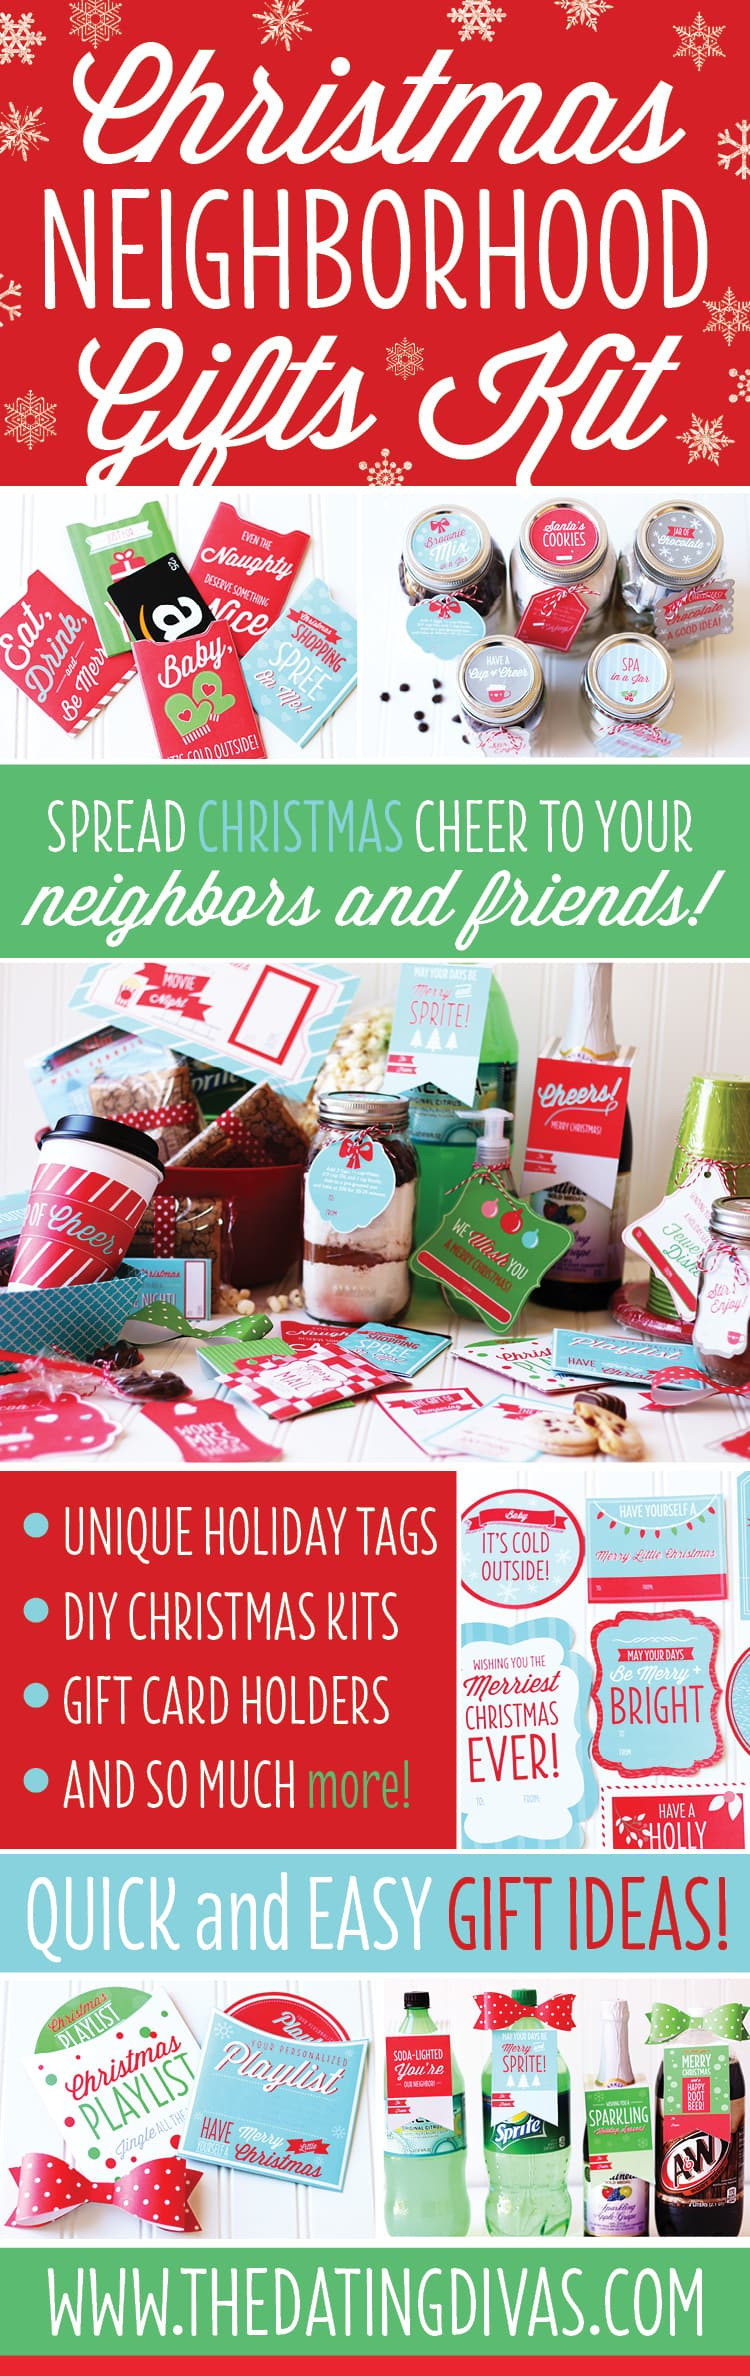 Neighbors Gift Ideas For Christmas  Christmas Neighbor Gift Ideas Pack